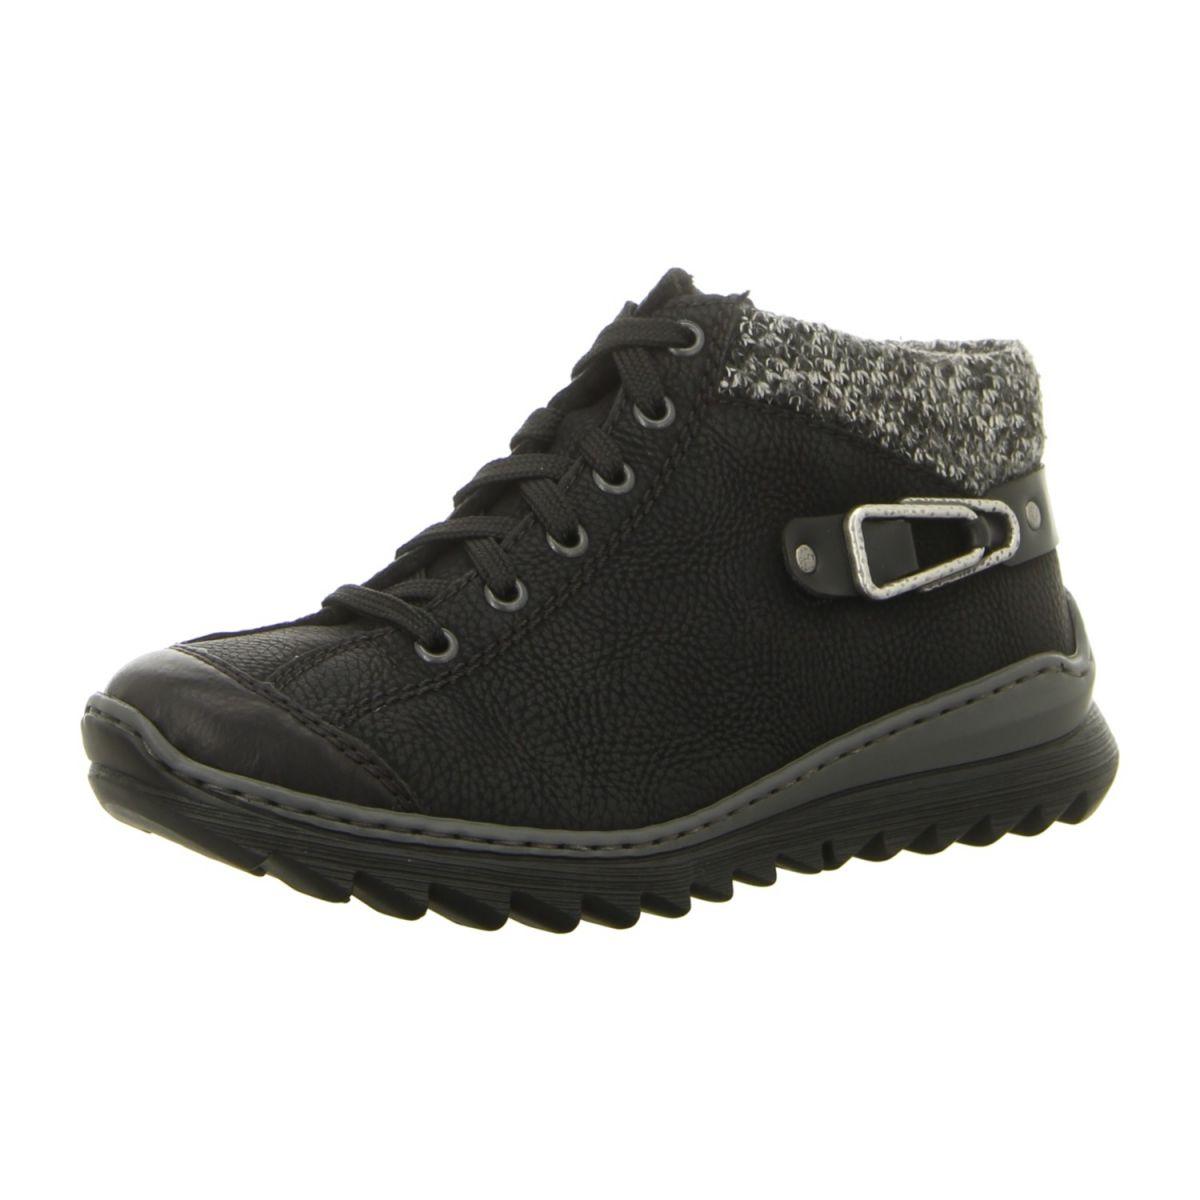 NEU  Rieker Stiefeletten M6238-01 - schwarz -   Schuhe   Accessoires ... e83dee7e79